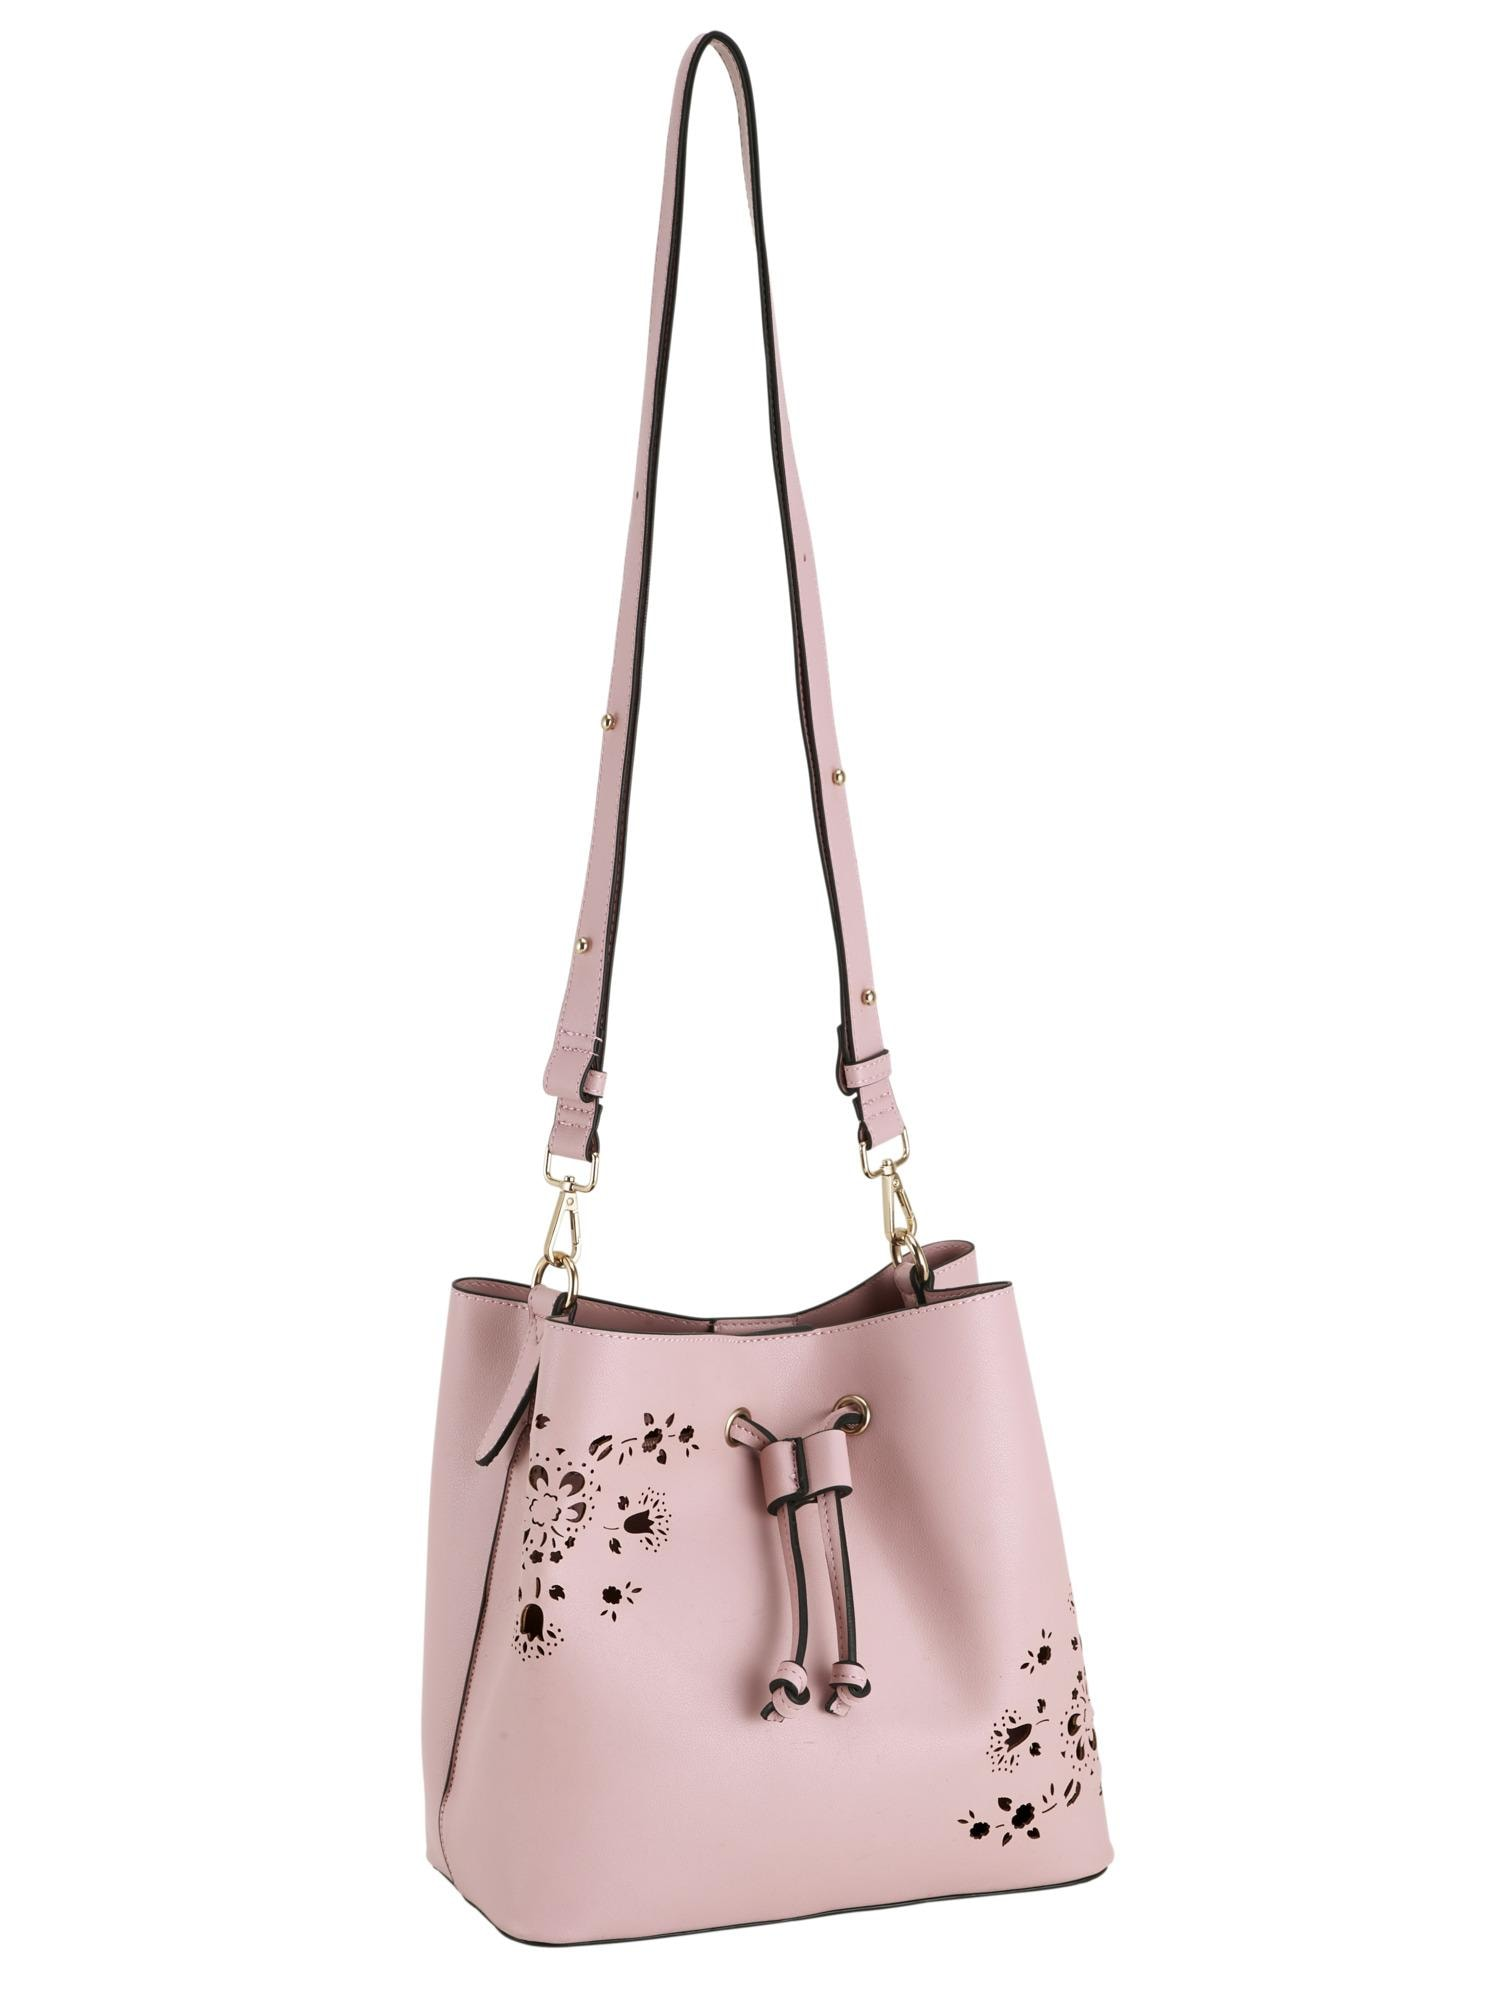 Beuteltasche | Taschen > Handtaschen > Beuteltaschen | heine